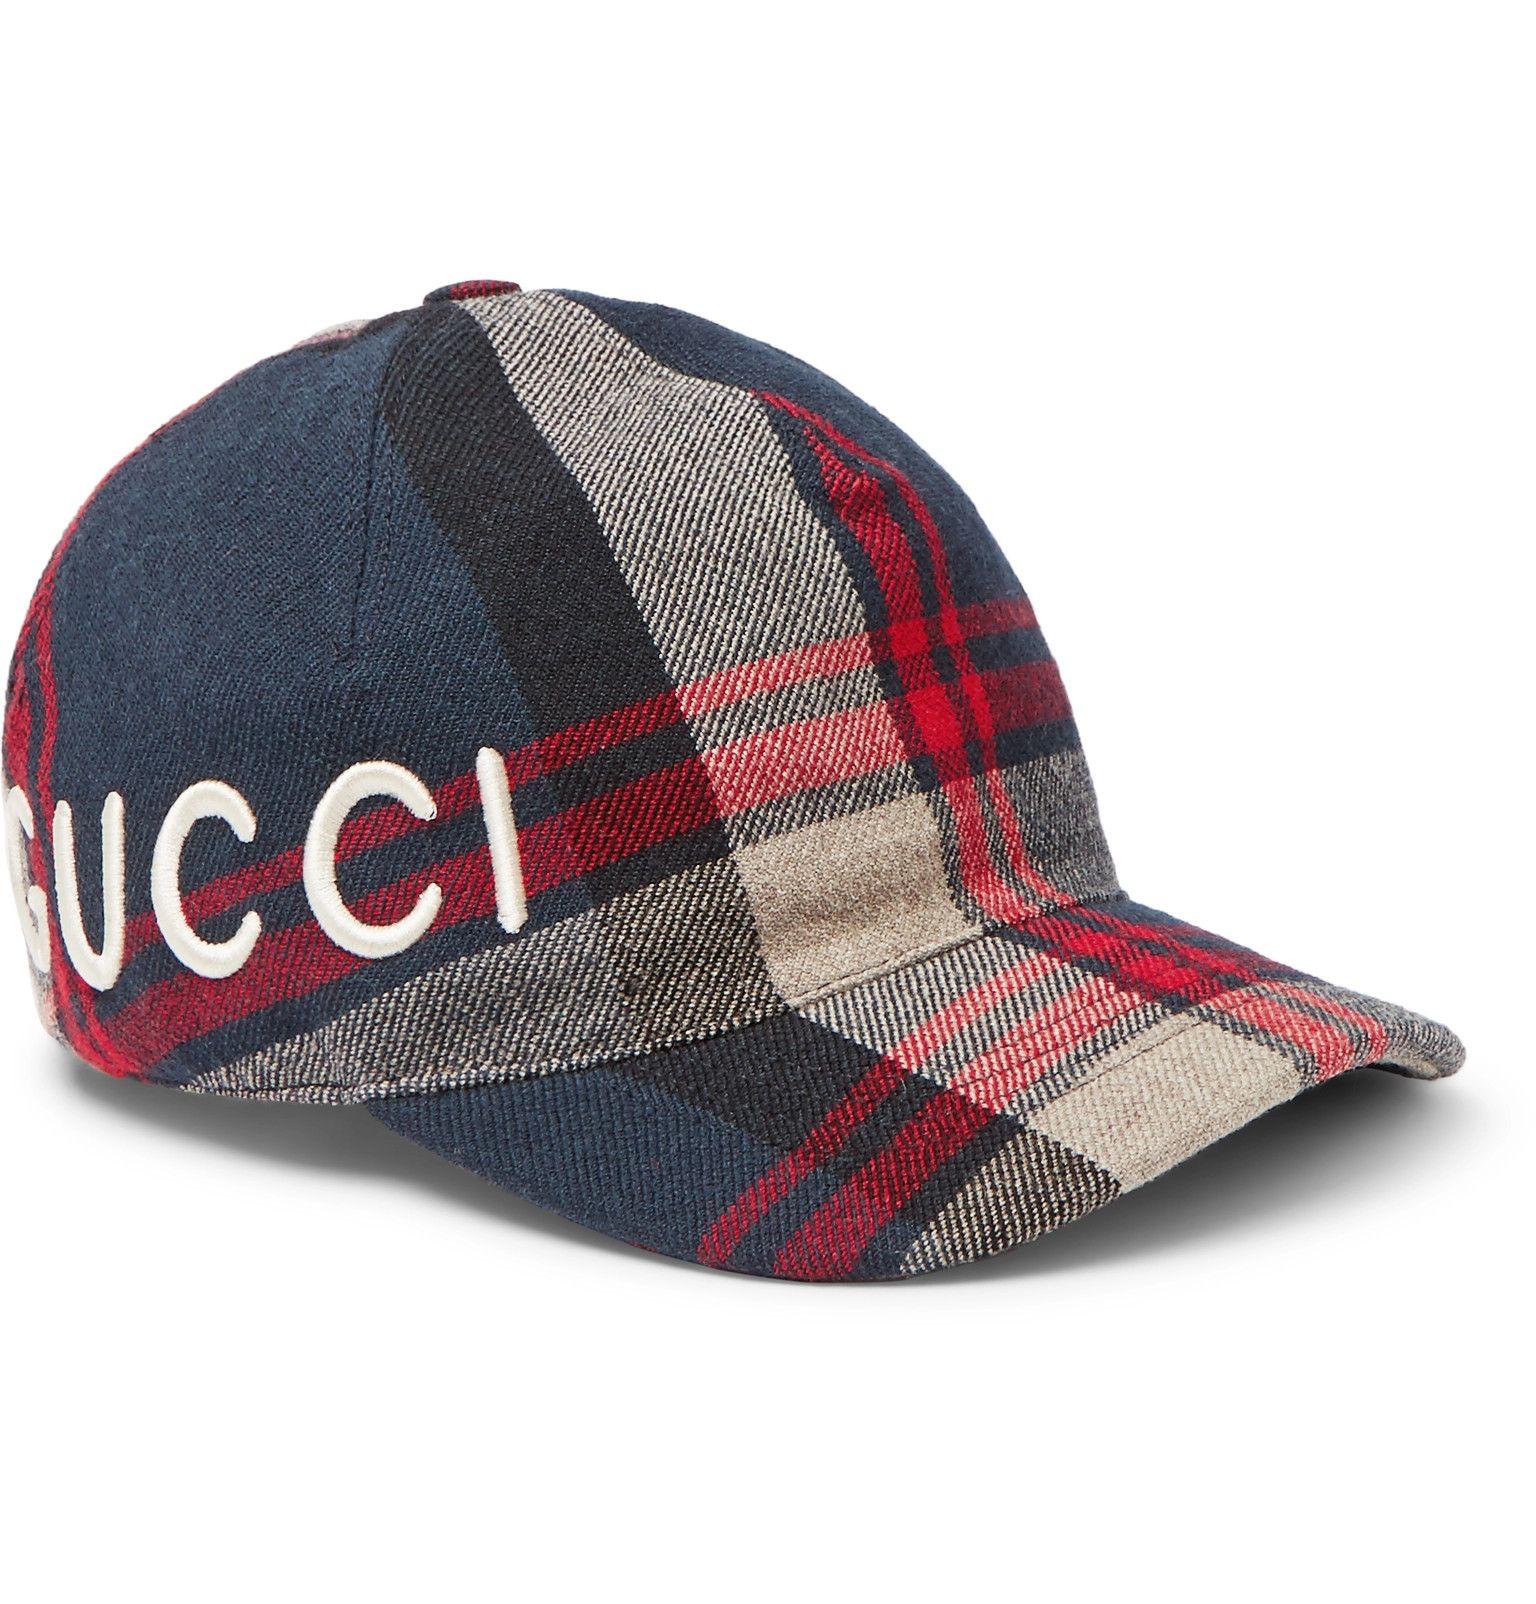 Loved Tartan Baseball Cap Gucci yEy8VebUTz